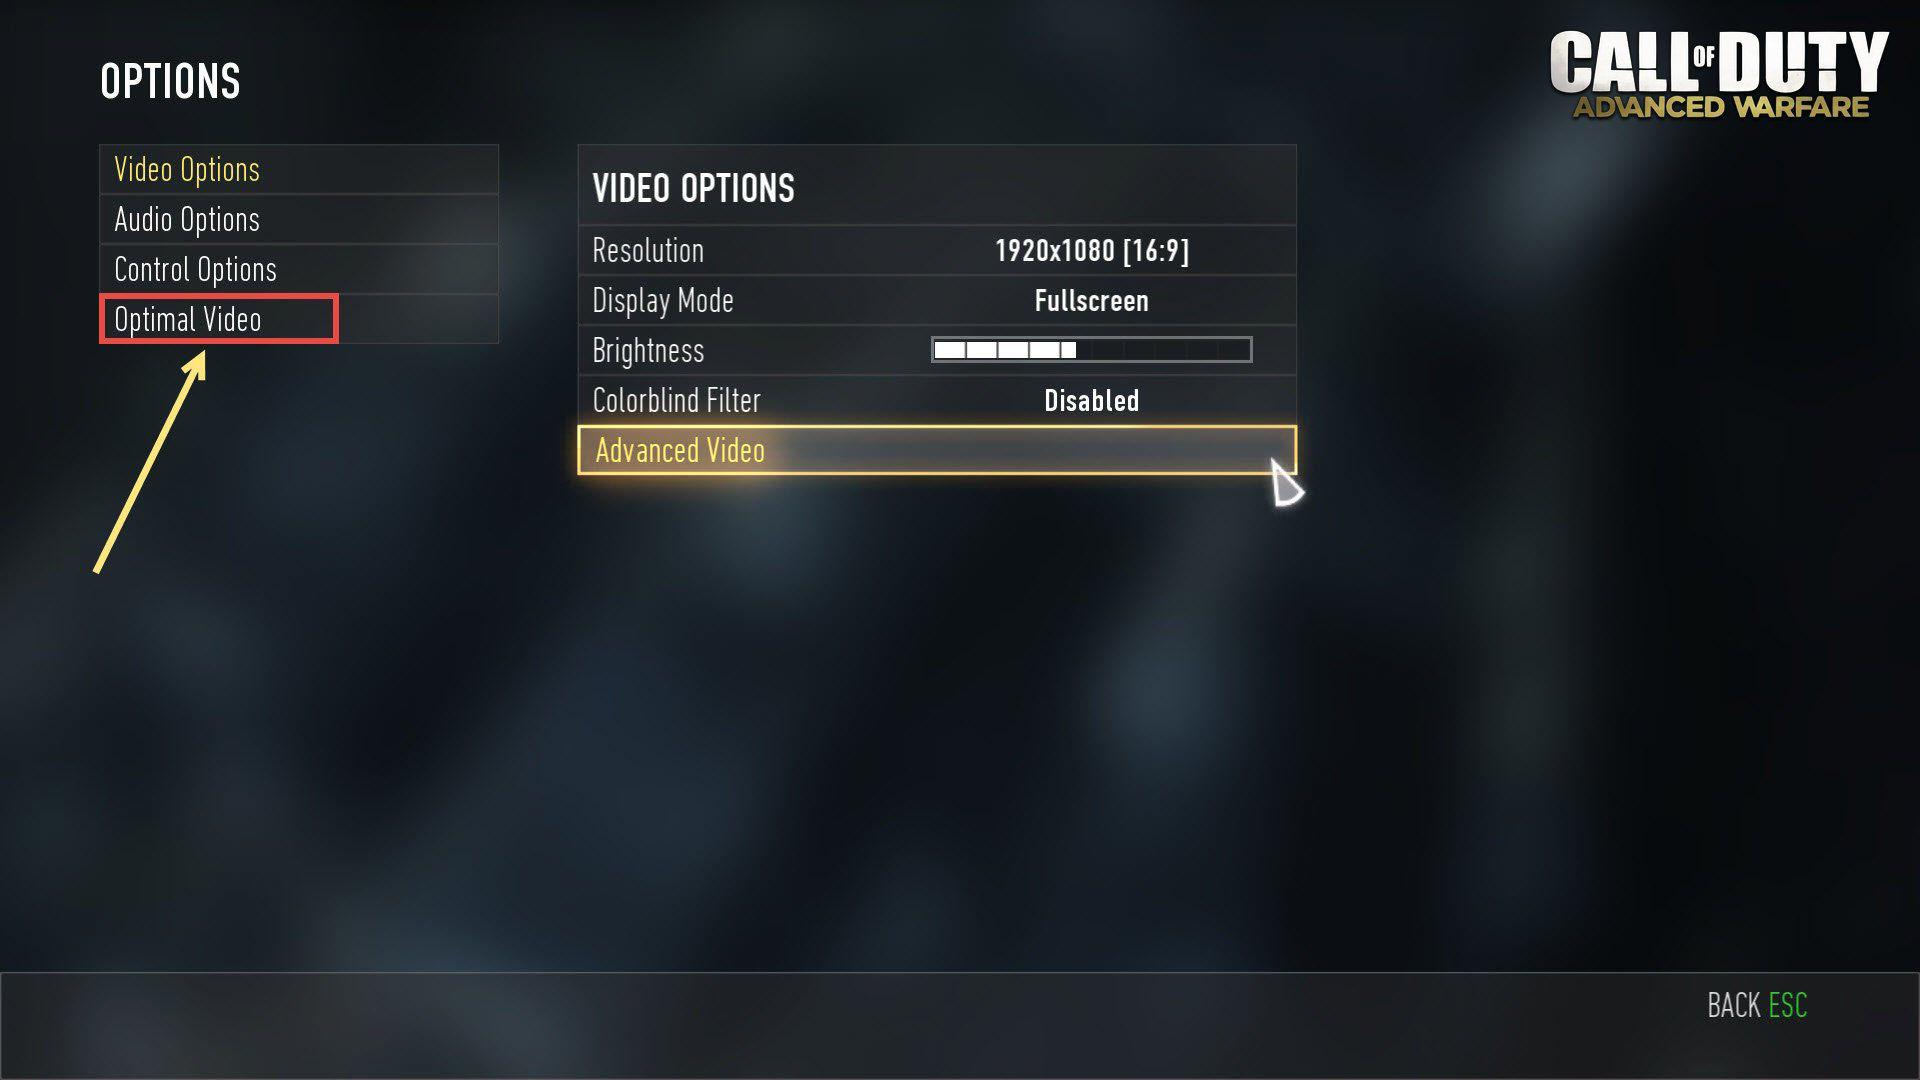 Call of Duty Advanced Warfare Optimal Video Settings